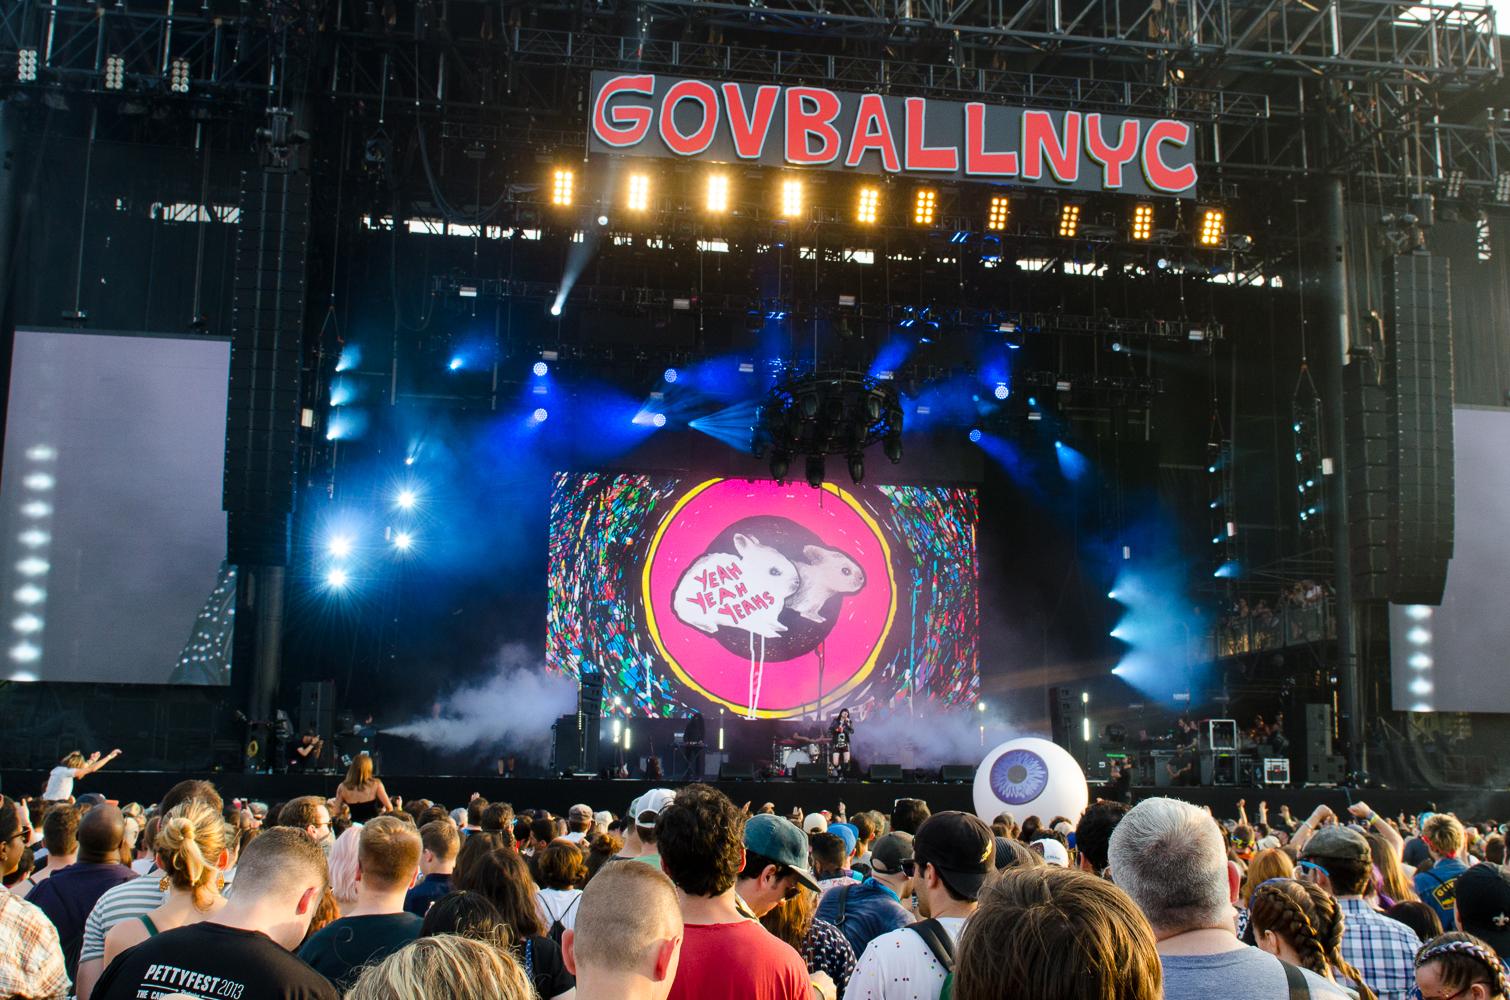 Governors Ball 2018, photo by Ben Kaye